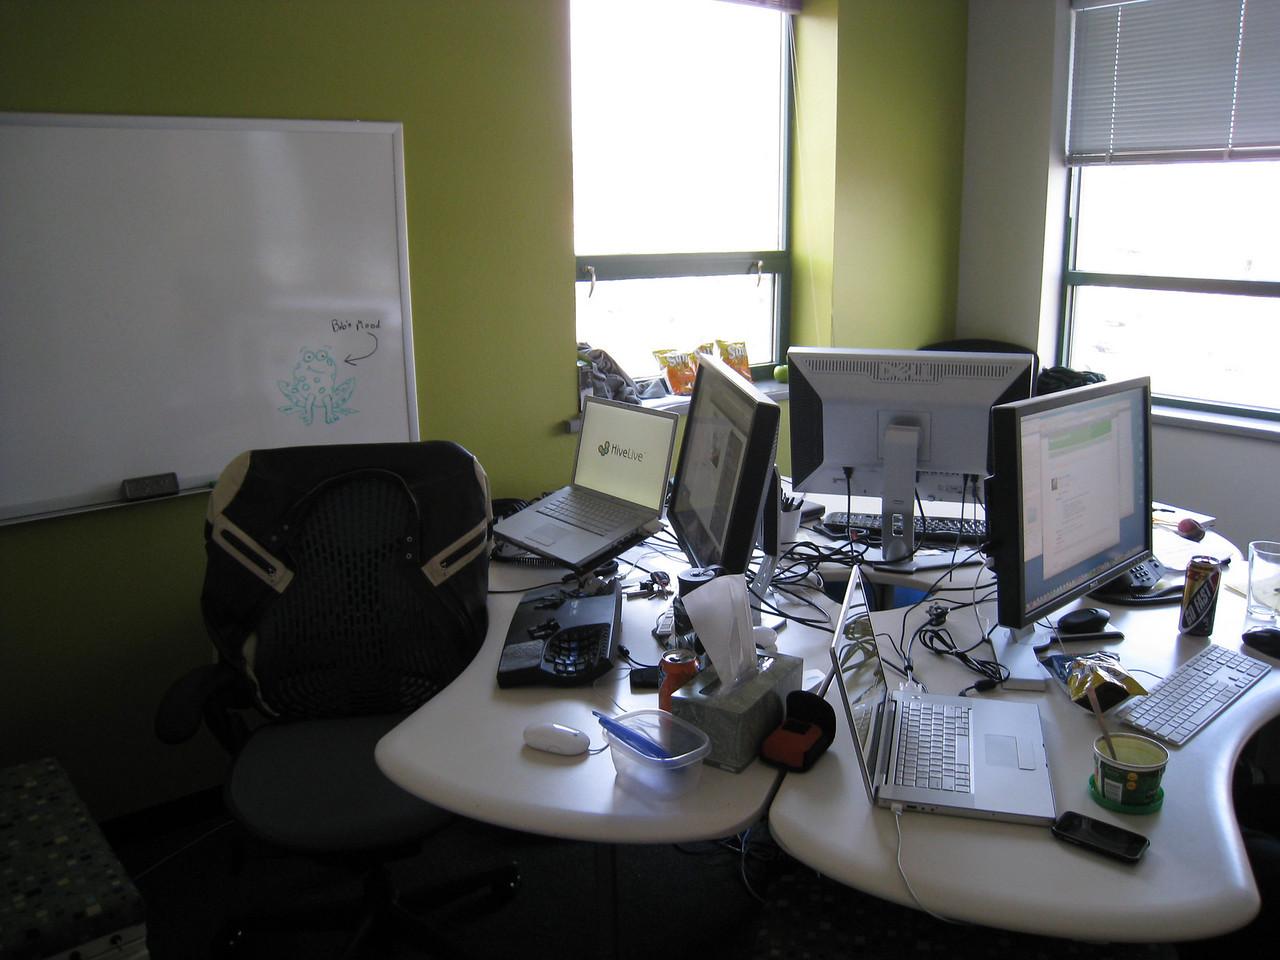 My desk on the left... the UI development room.